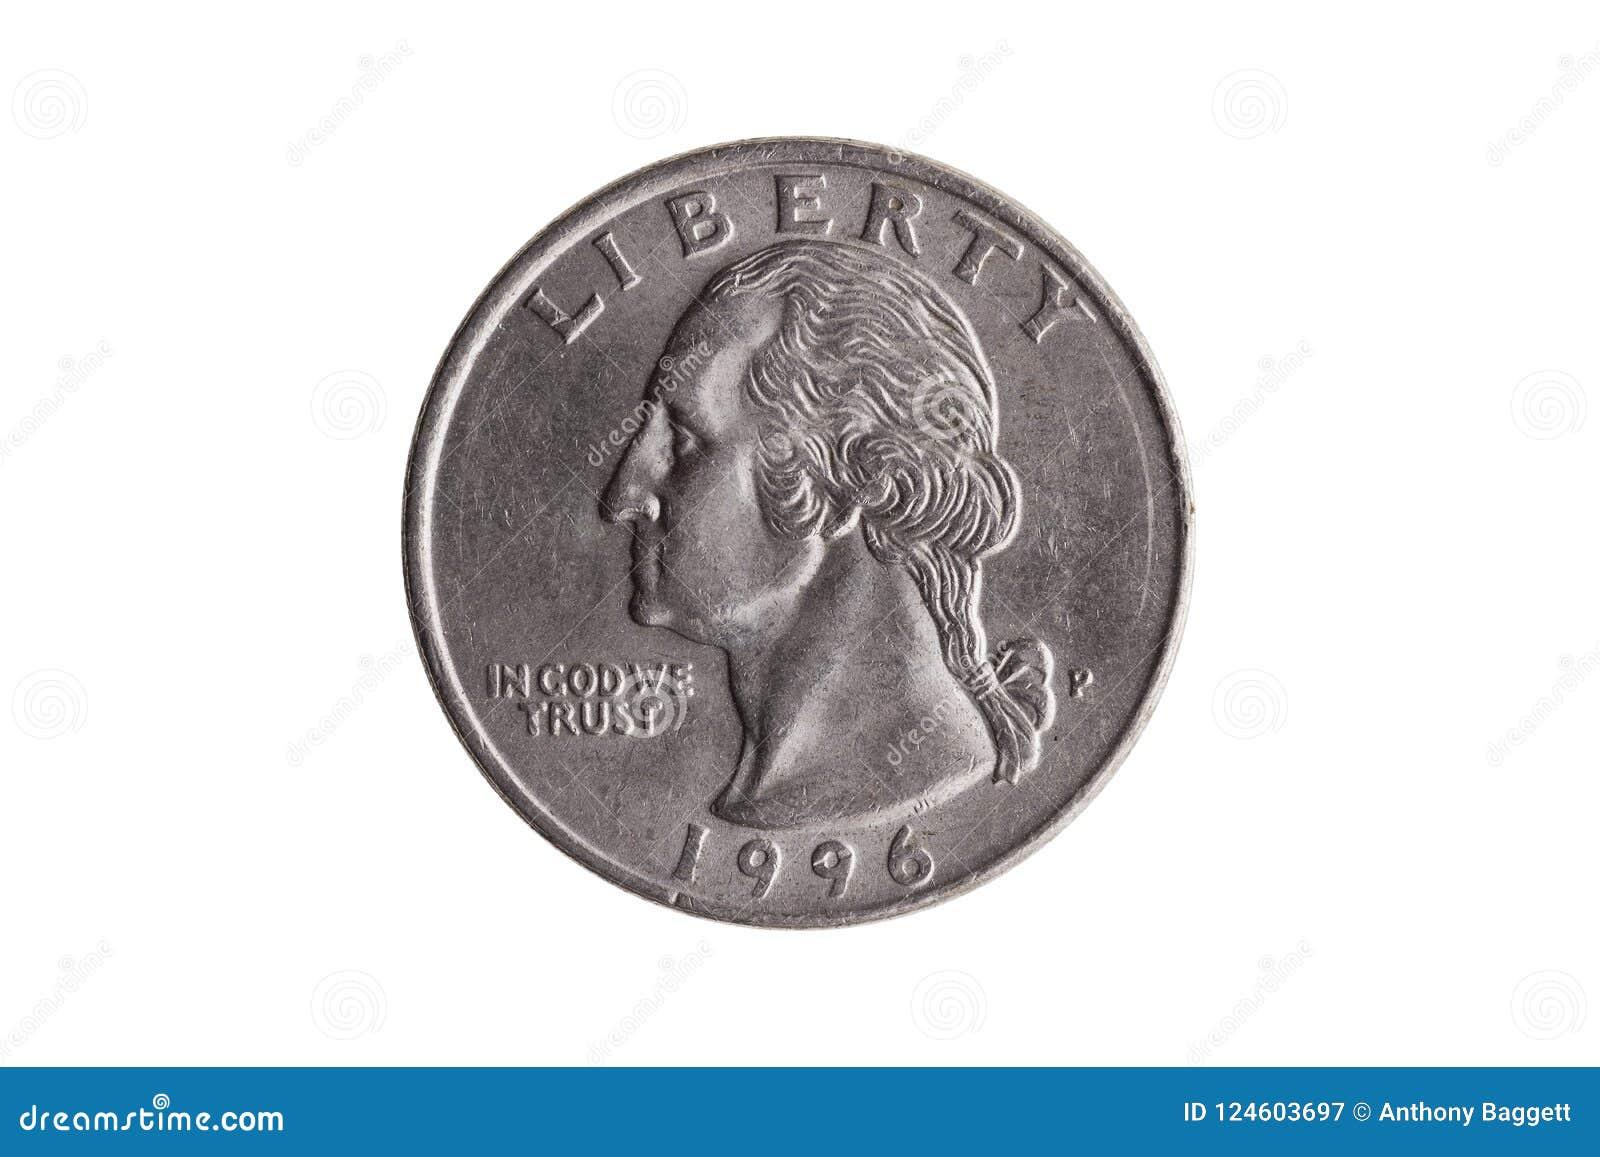 USA quarter dollar George Washington